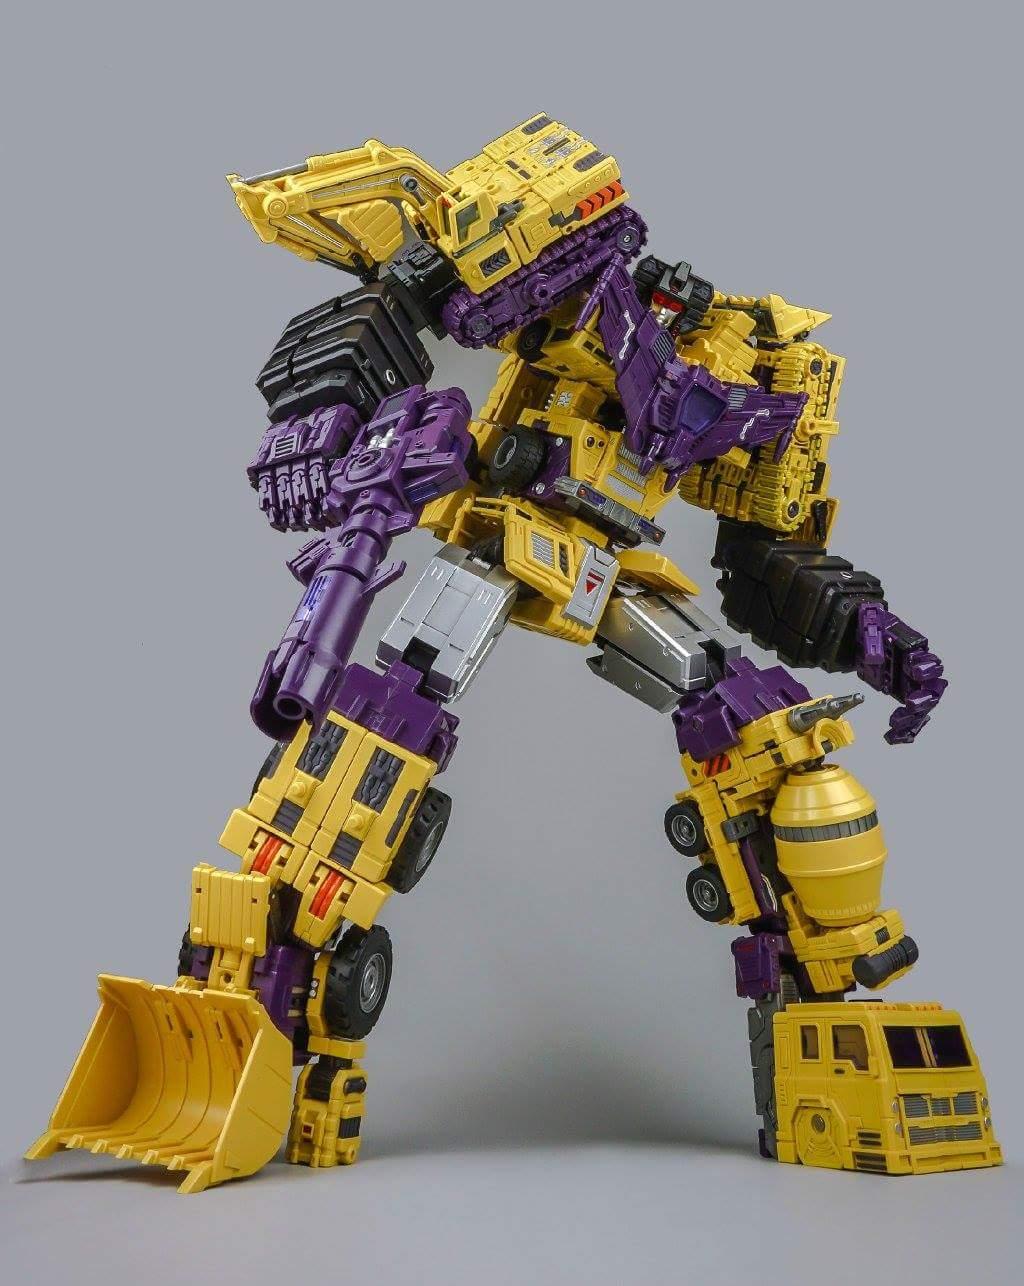 [Toyworld] Produit Tiers - Jouet TW-C Constructor aka Devastator/Dévastateur (Version vert G1 et jaune G2) - Page 8 P4ao9Mw8